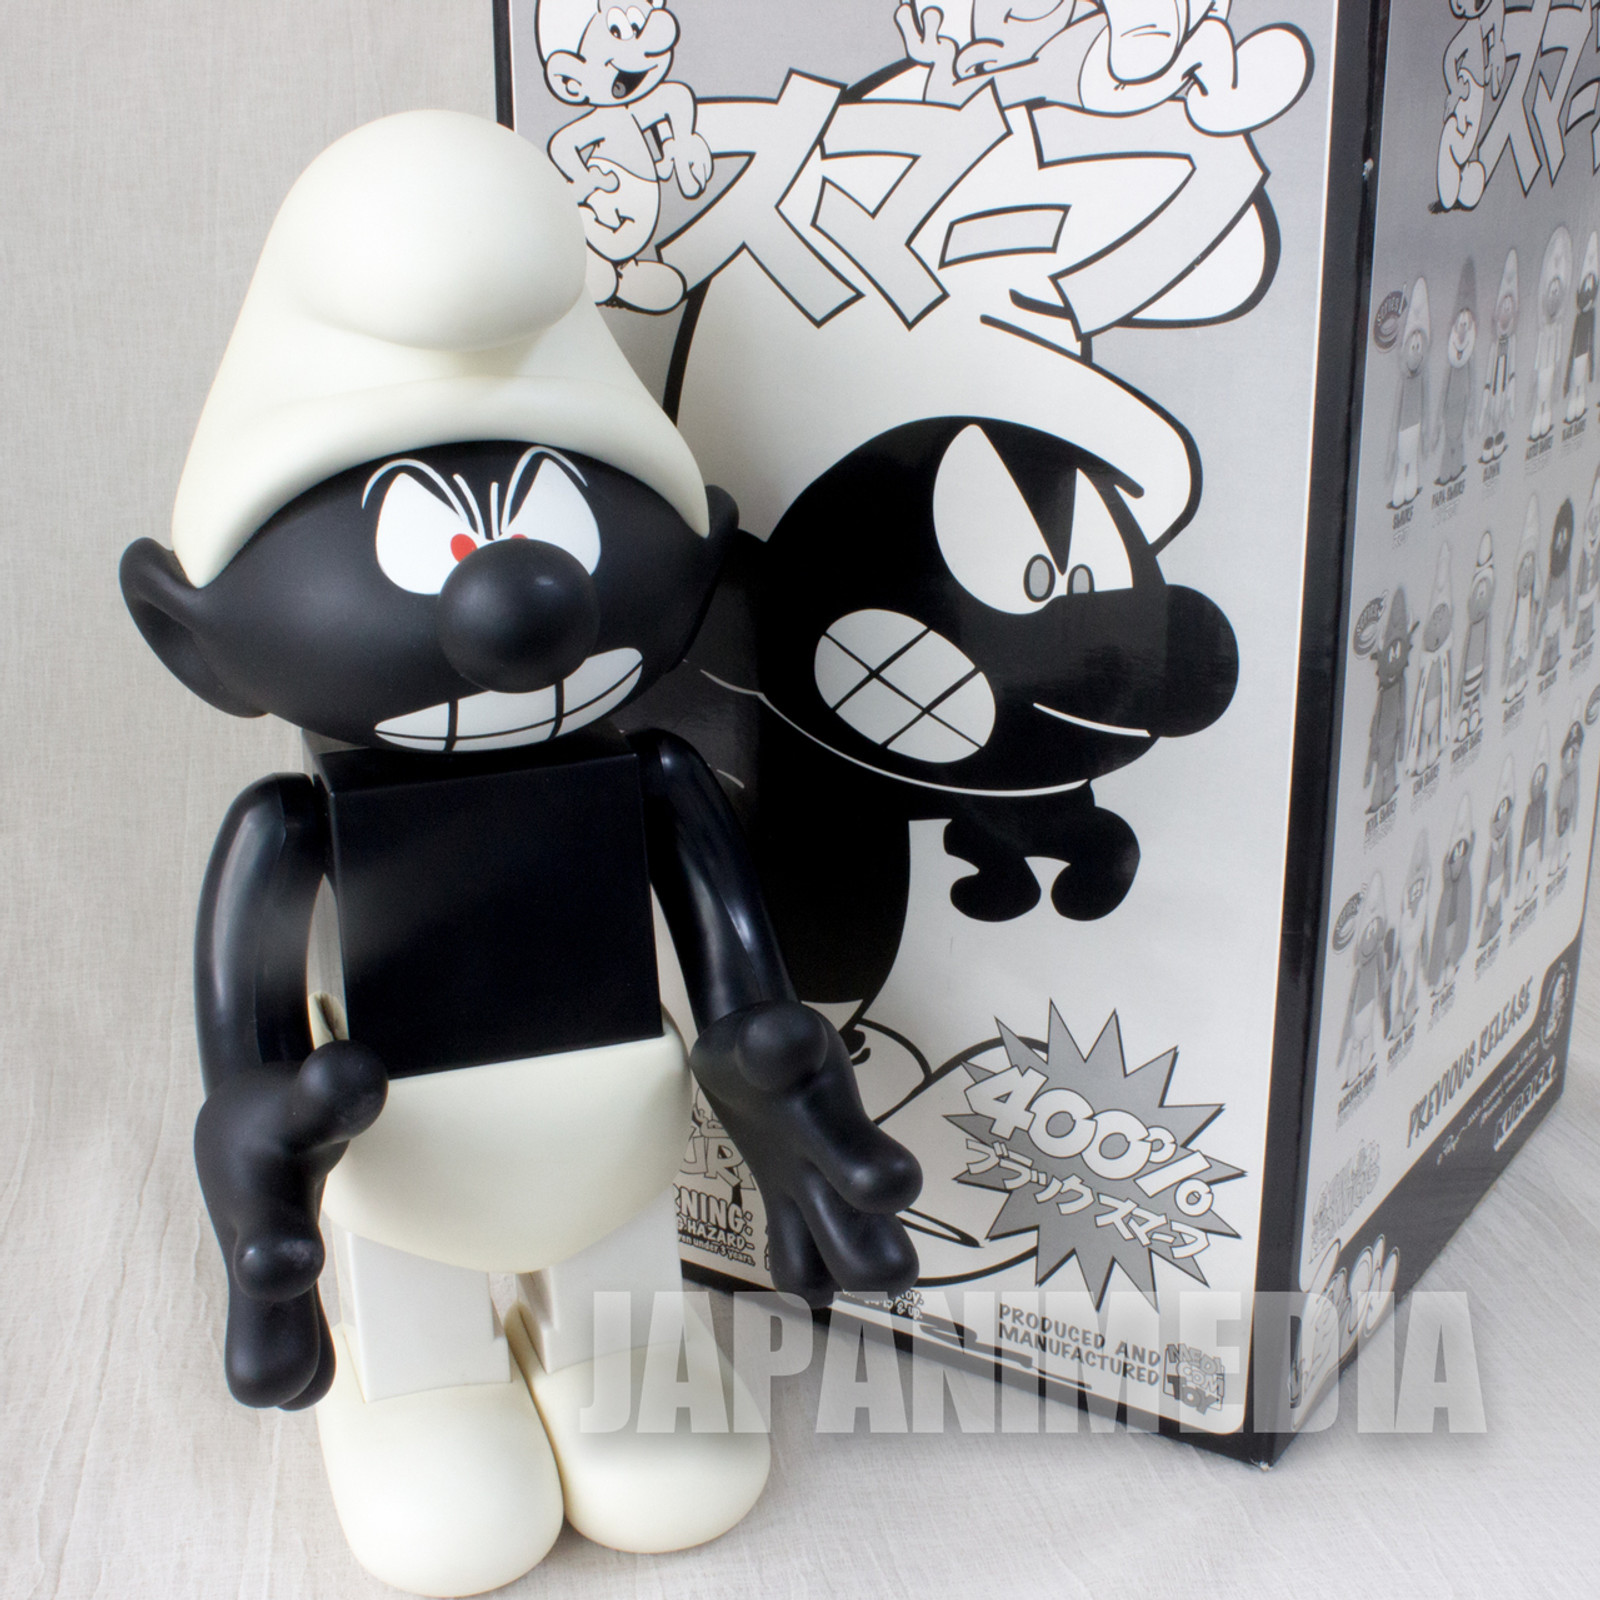 RARE! Kubrick 400% Black Smurf Figure Medicom Toy JAPAN SMURFS